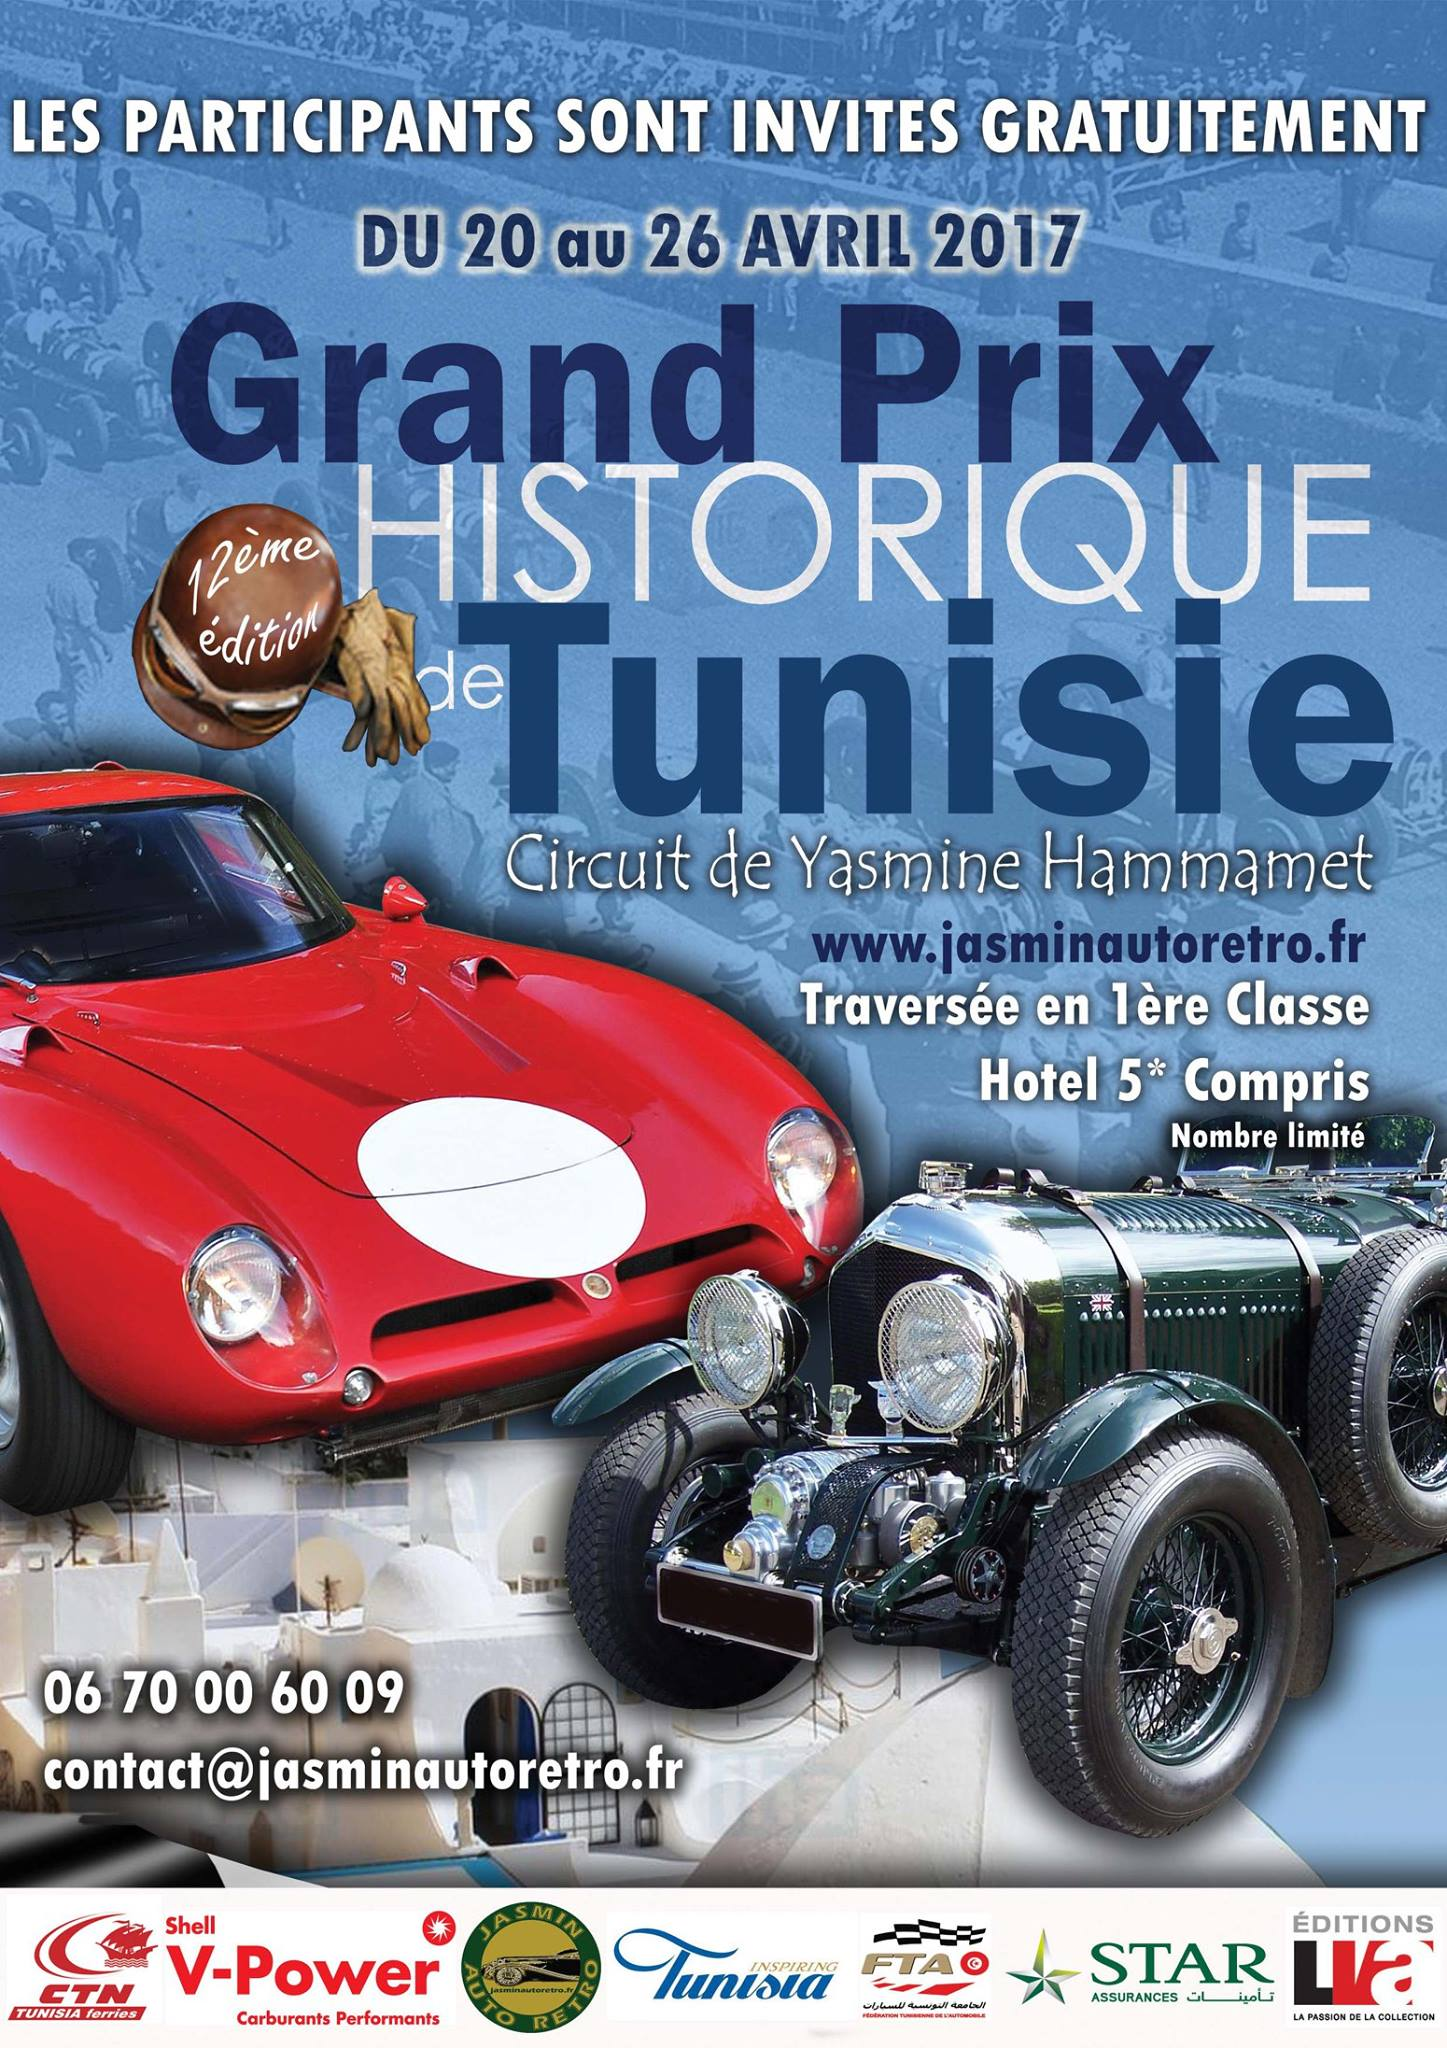 Grand Prix Historique de Tunisie 2017